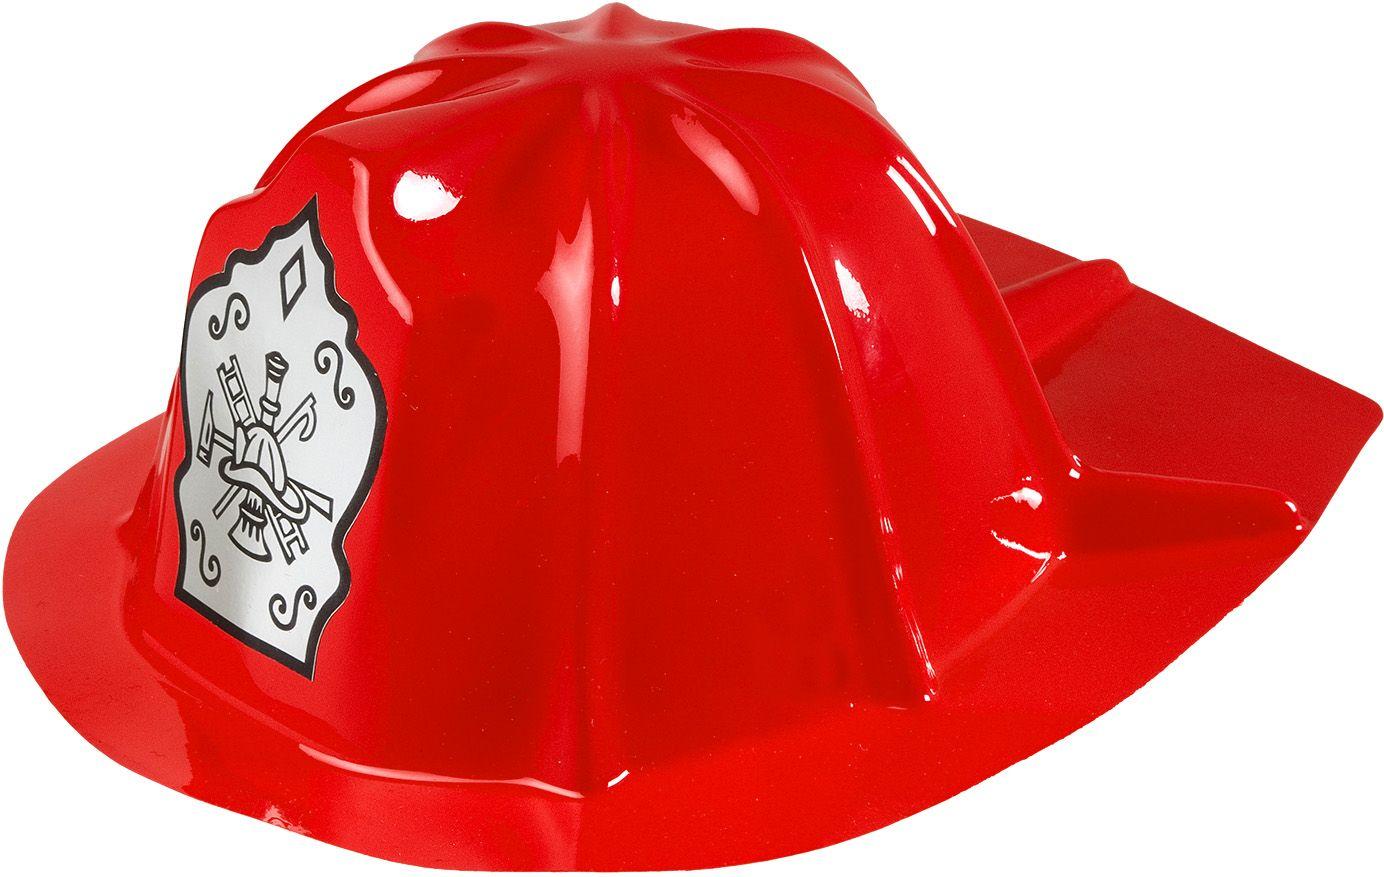 Rode brandweerhelm